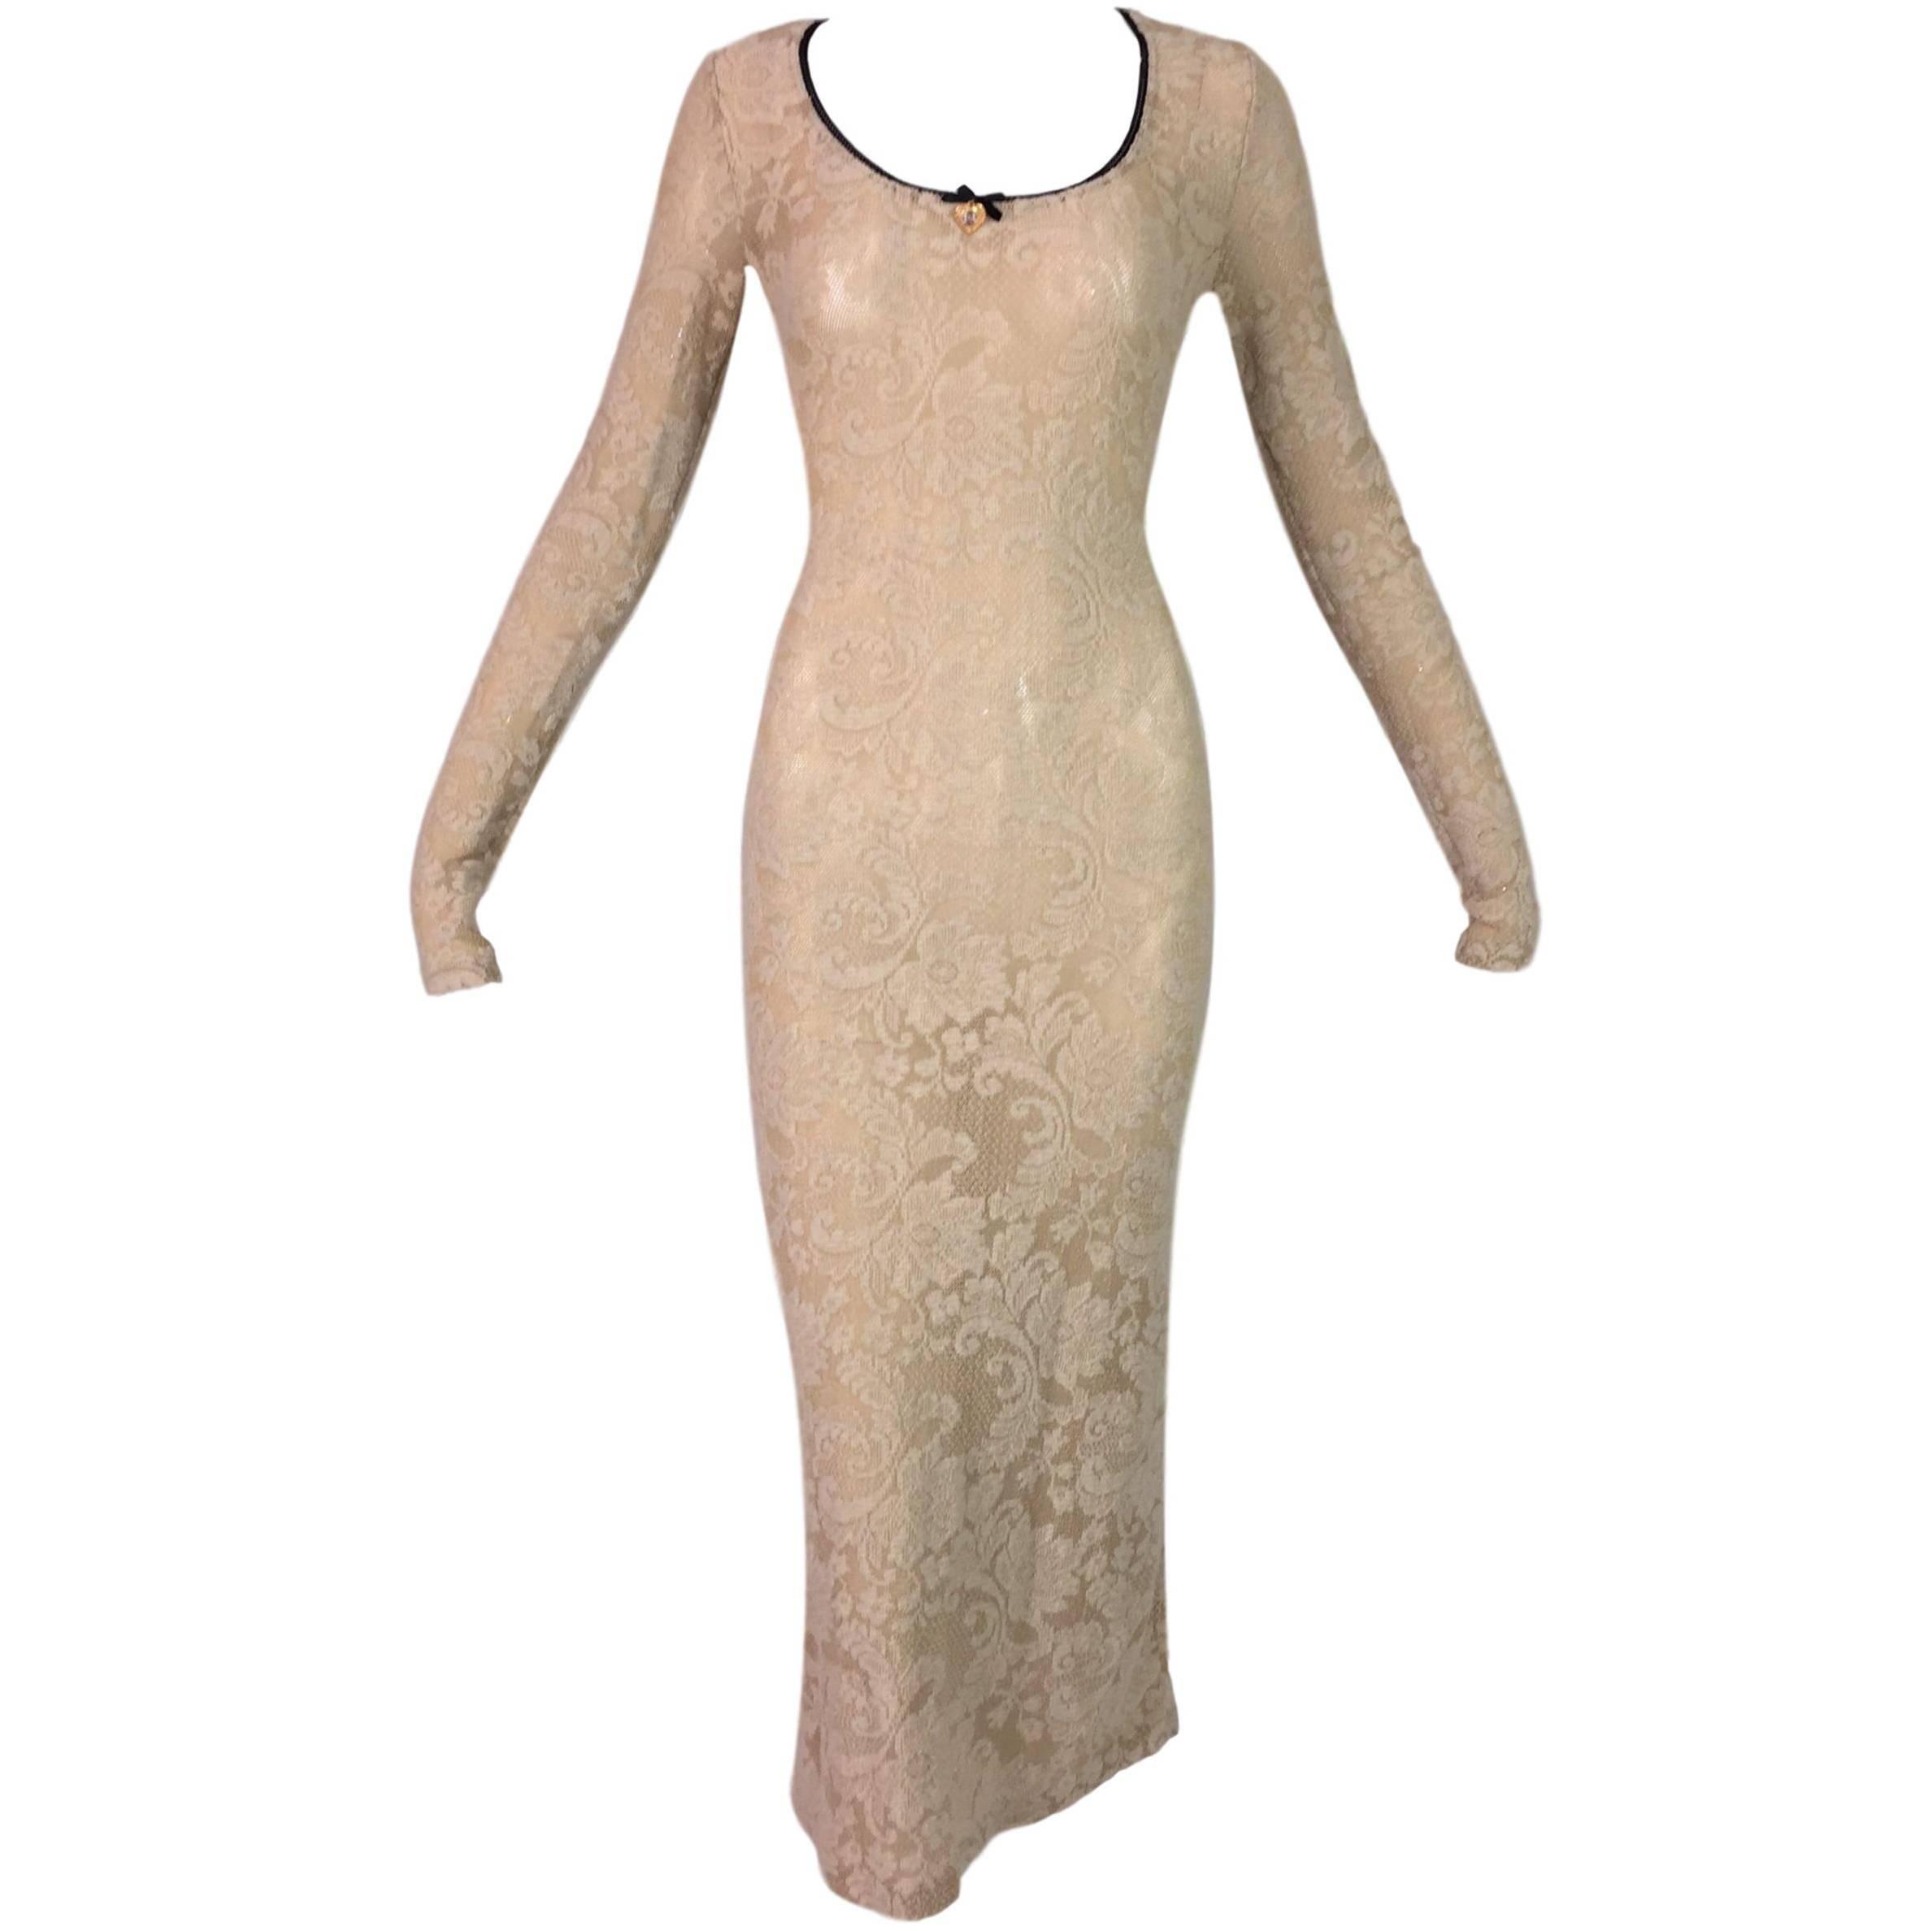 Mini Nylon Spandex Mini Dress One Size Fits Most Yellow Hole Fishnet